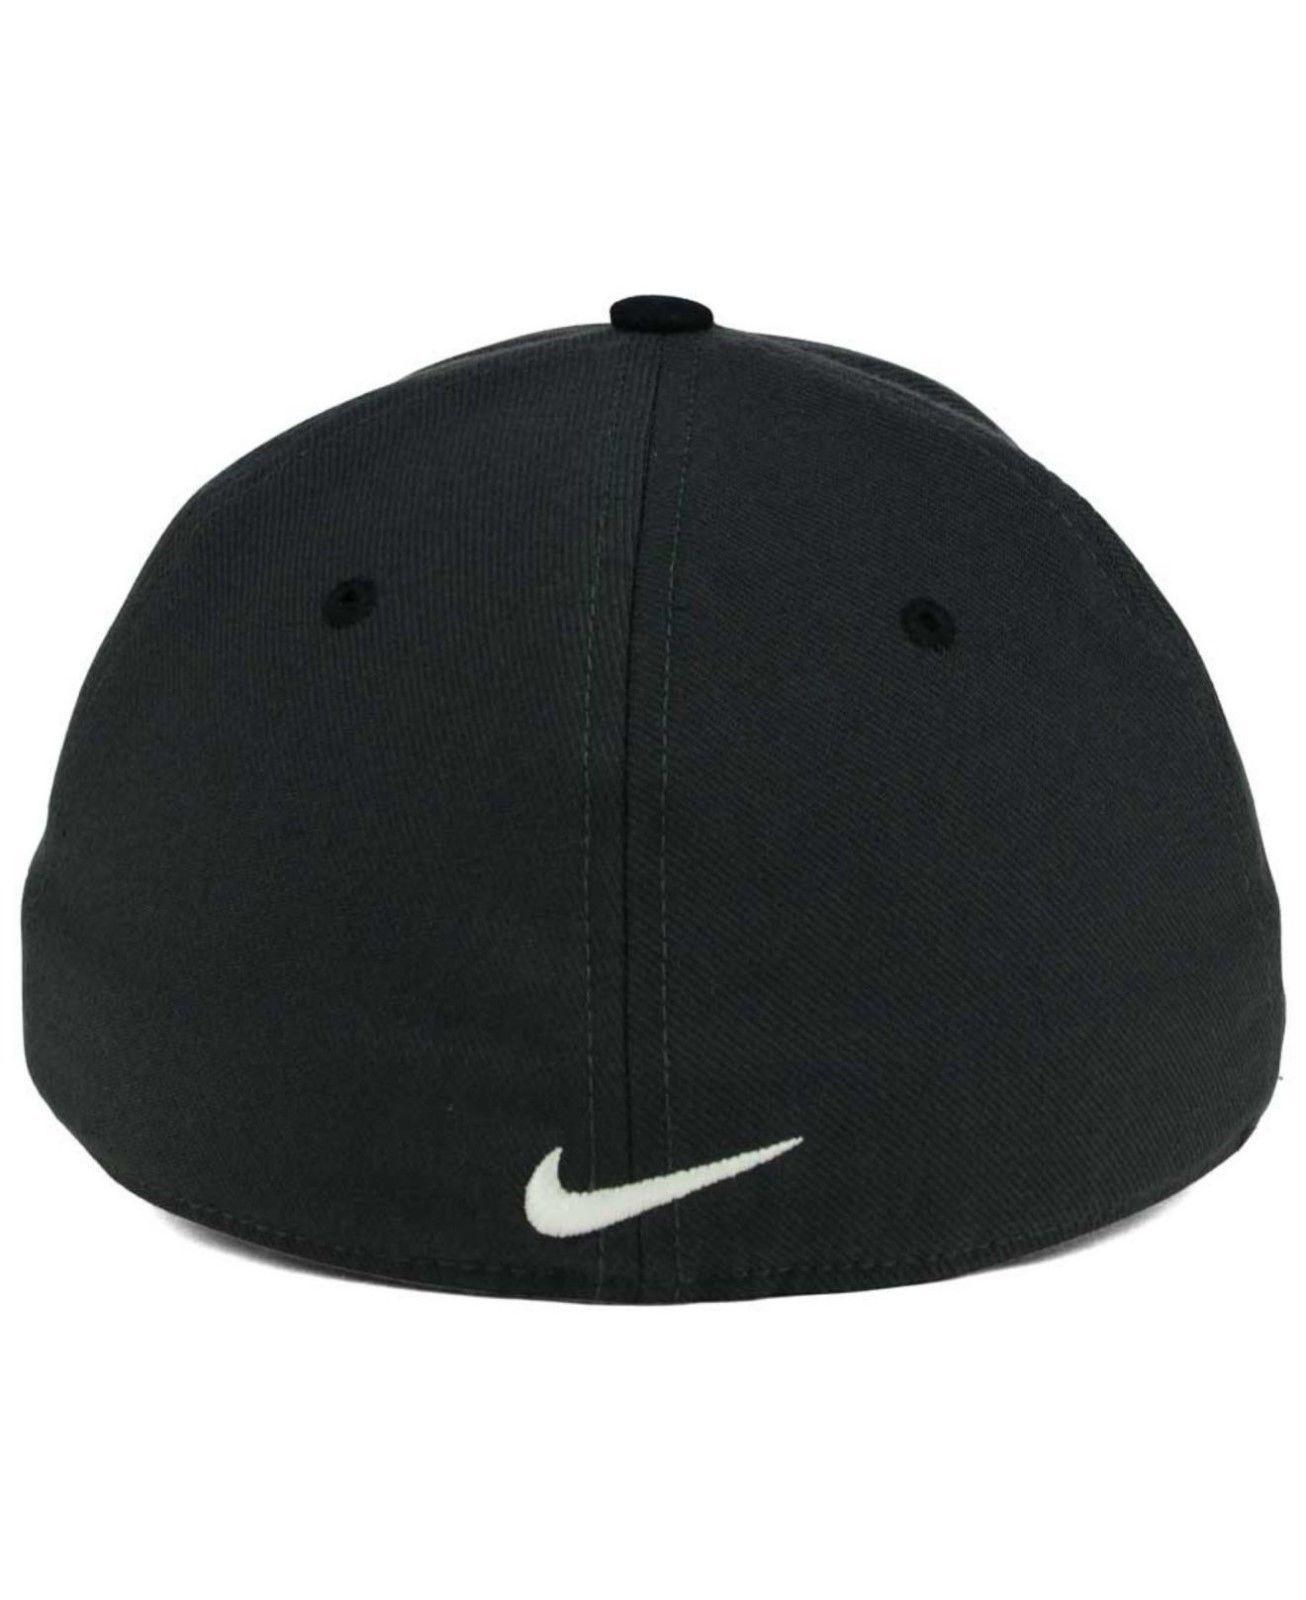 acad89072795b NWT New Syracuse Orange Nike Dri-Fit NCAA Best L91 Flex-Fit Hat